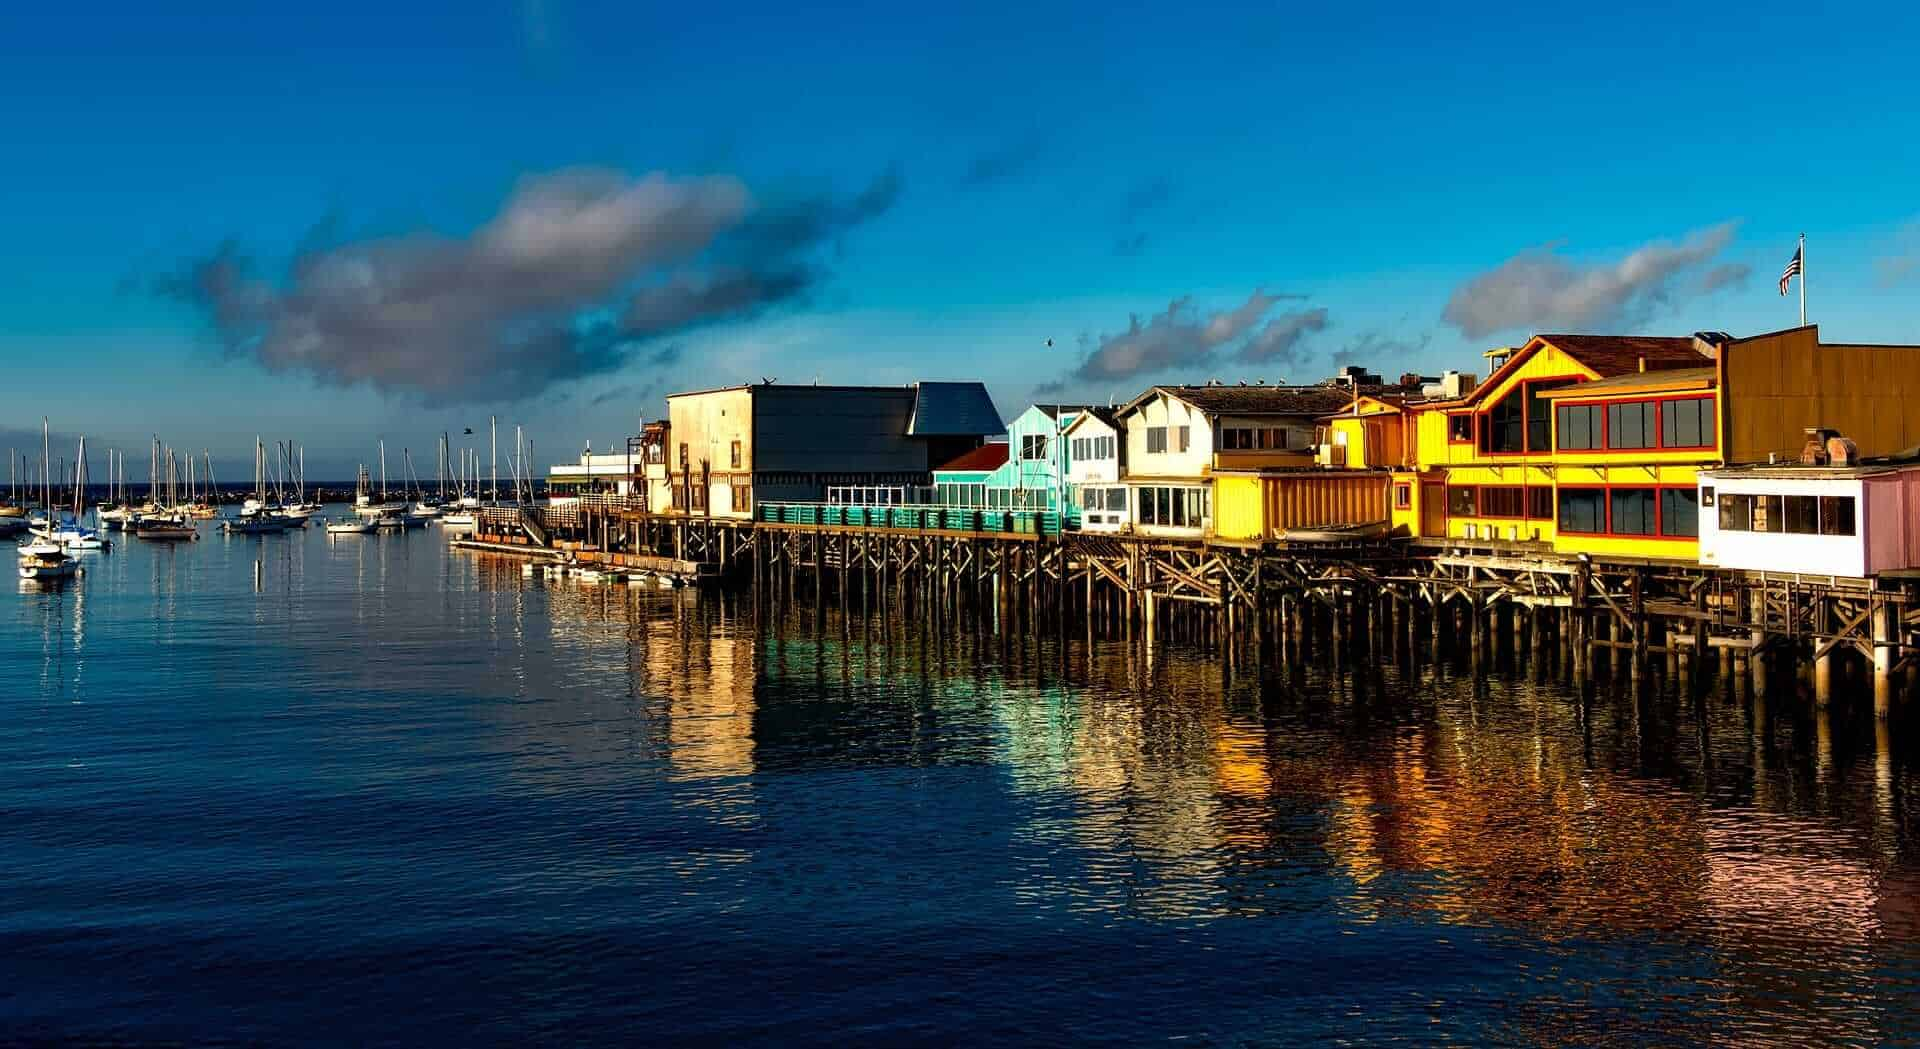 Fishermans Wharf, San Francisco, USA